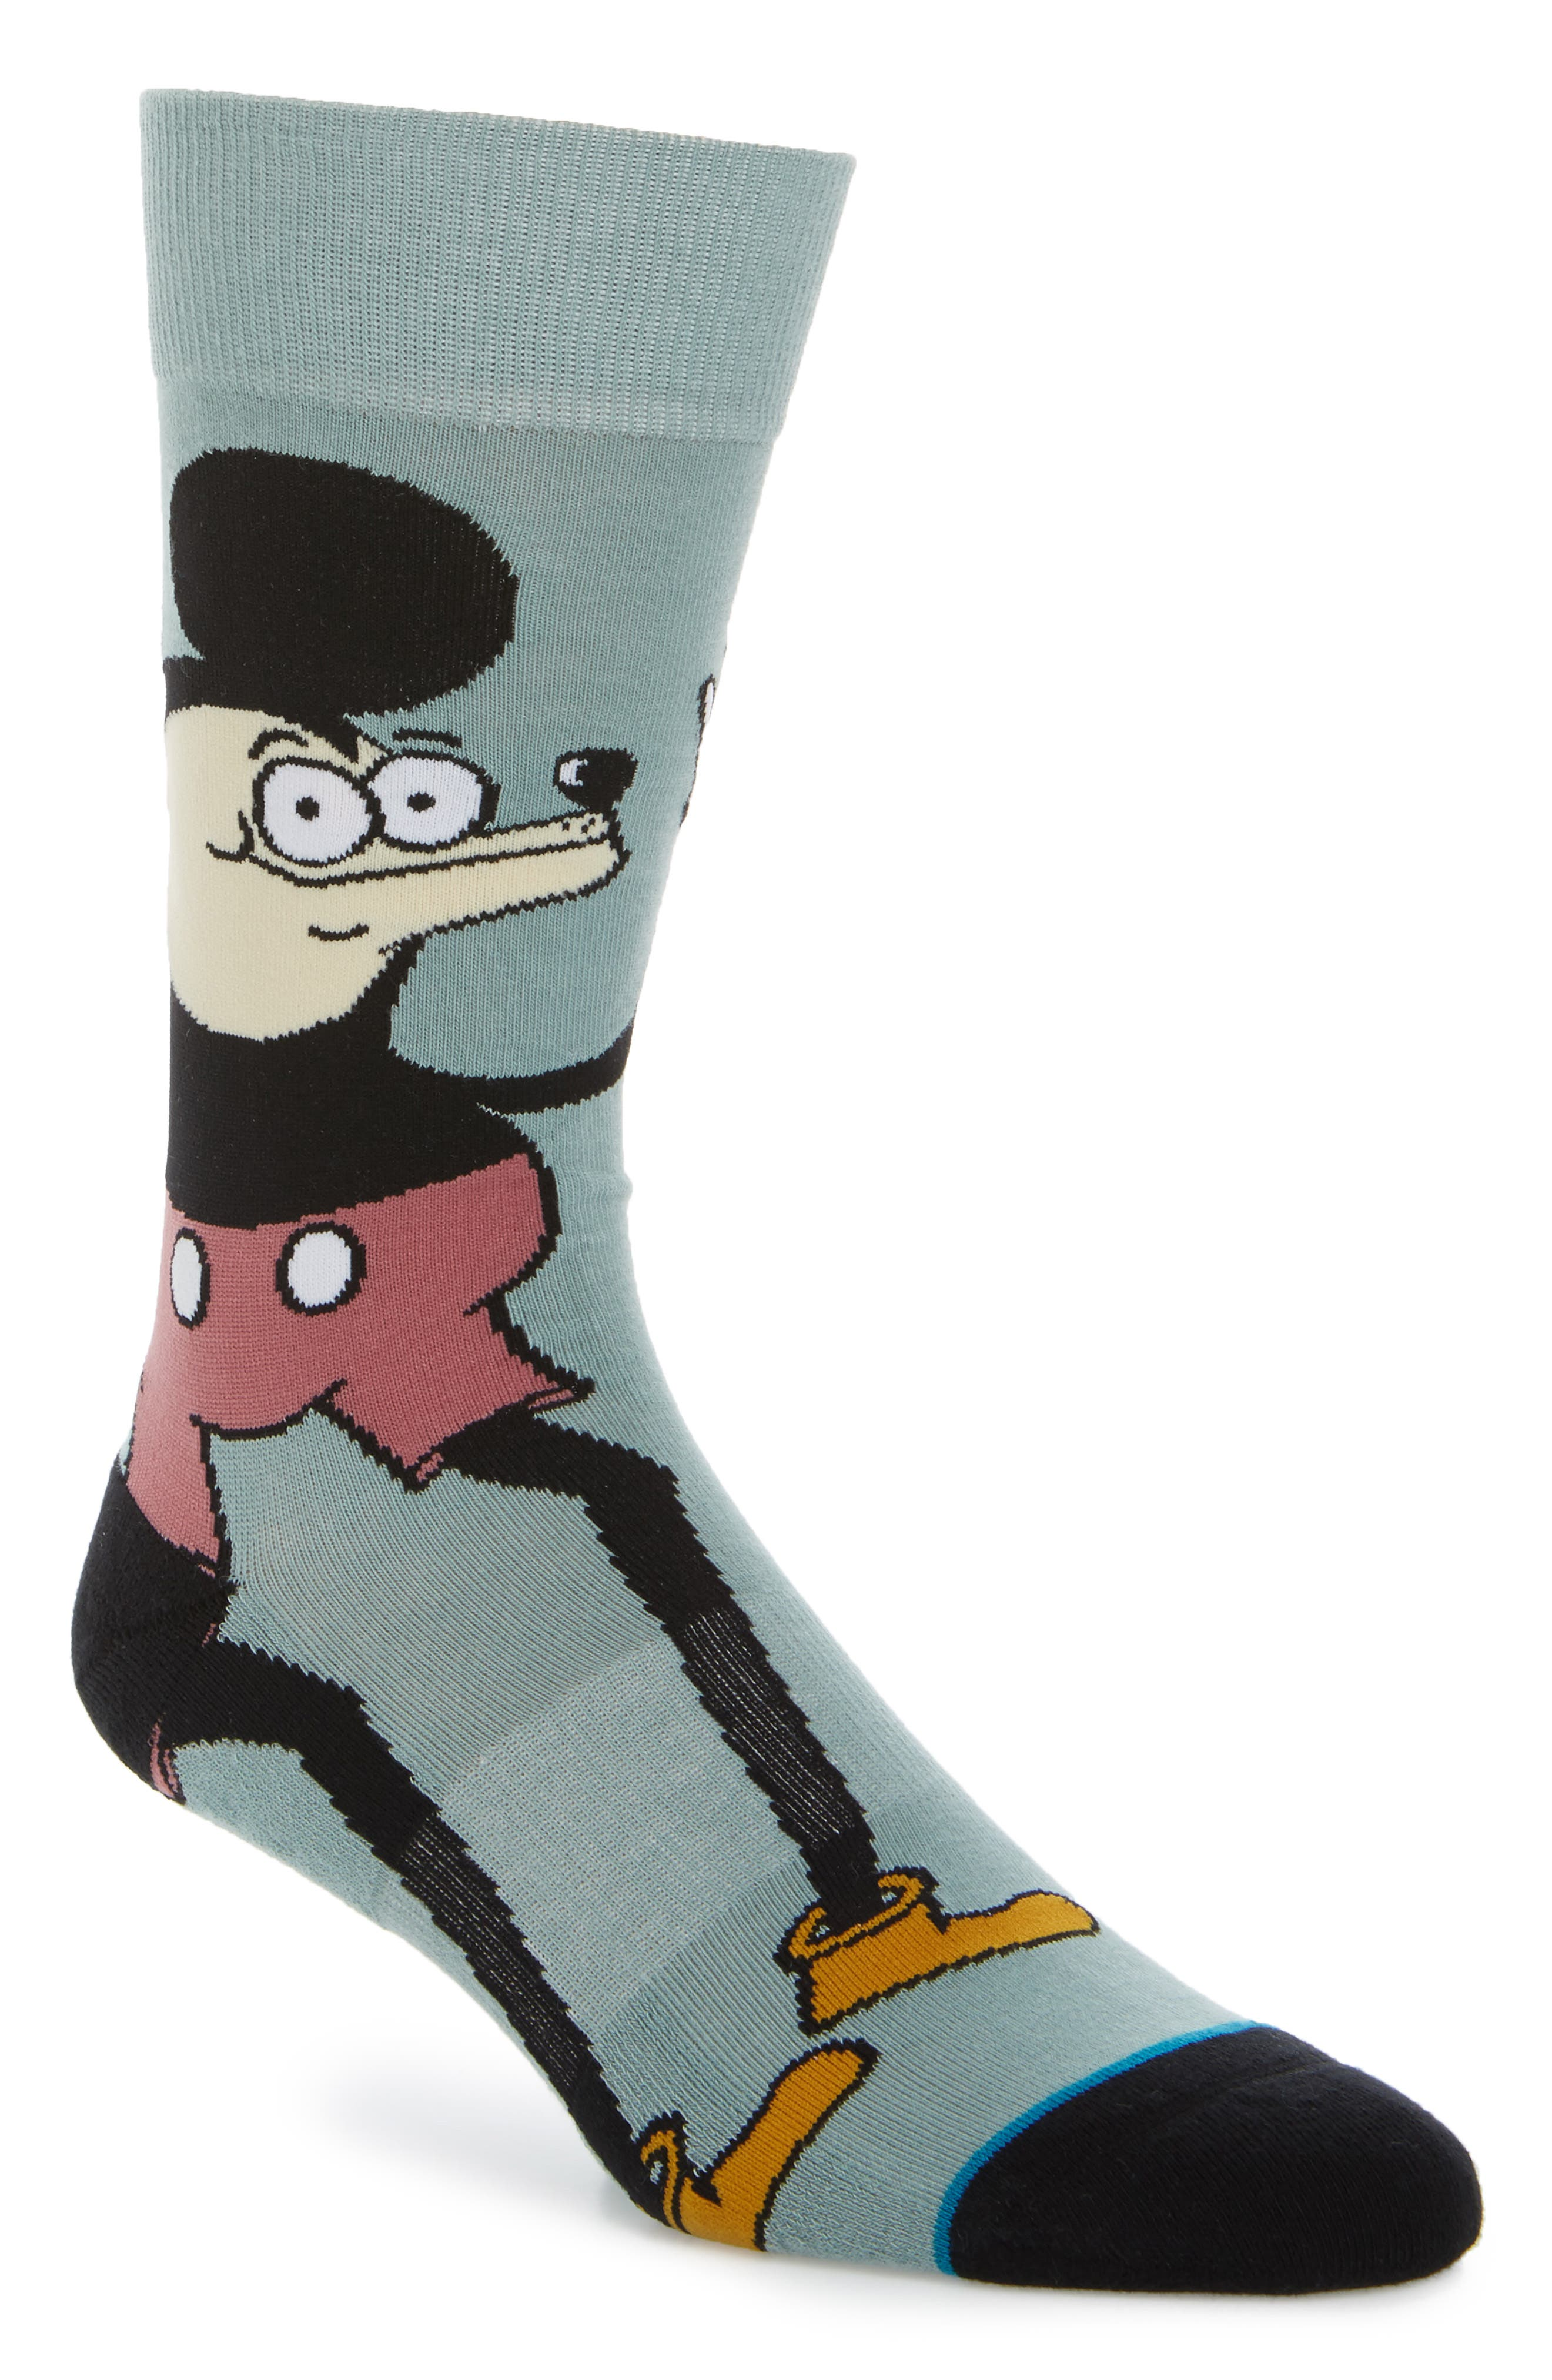 Alternate Image 1 Selected - Stance Howell Mouse Socks